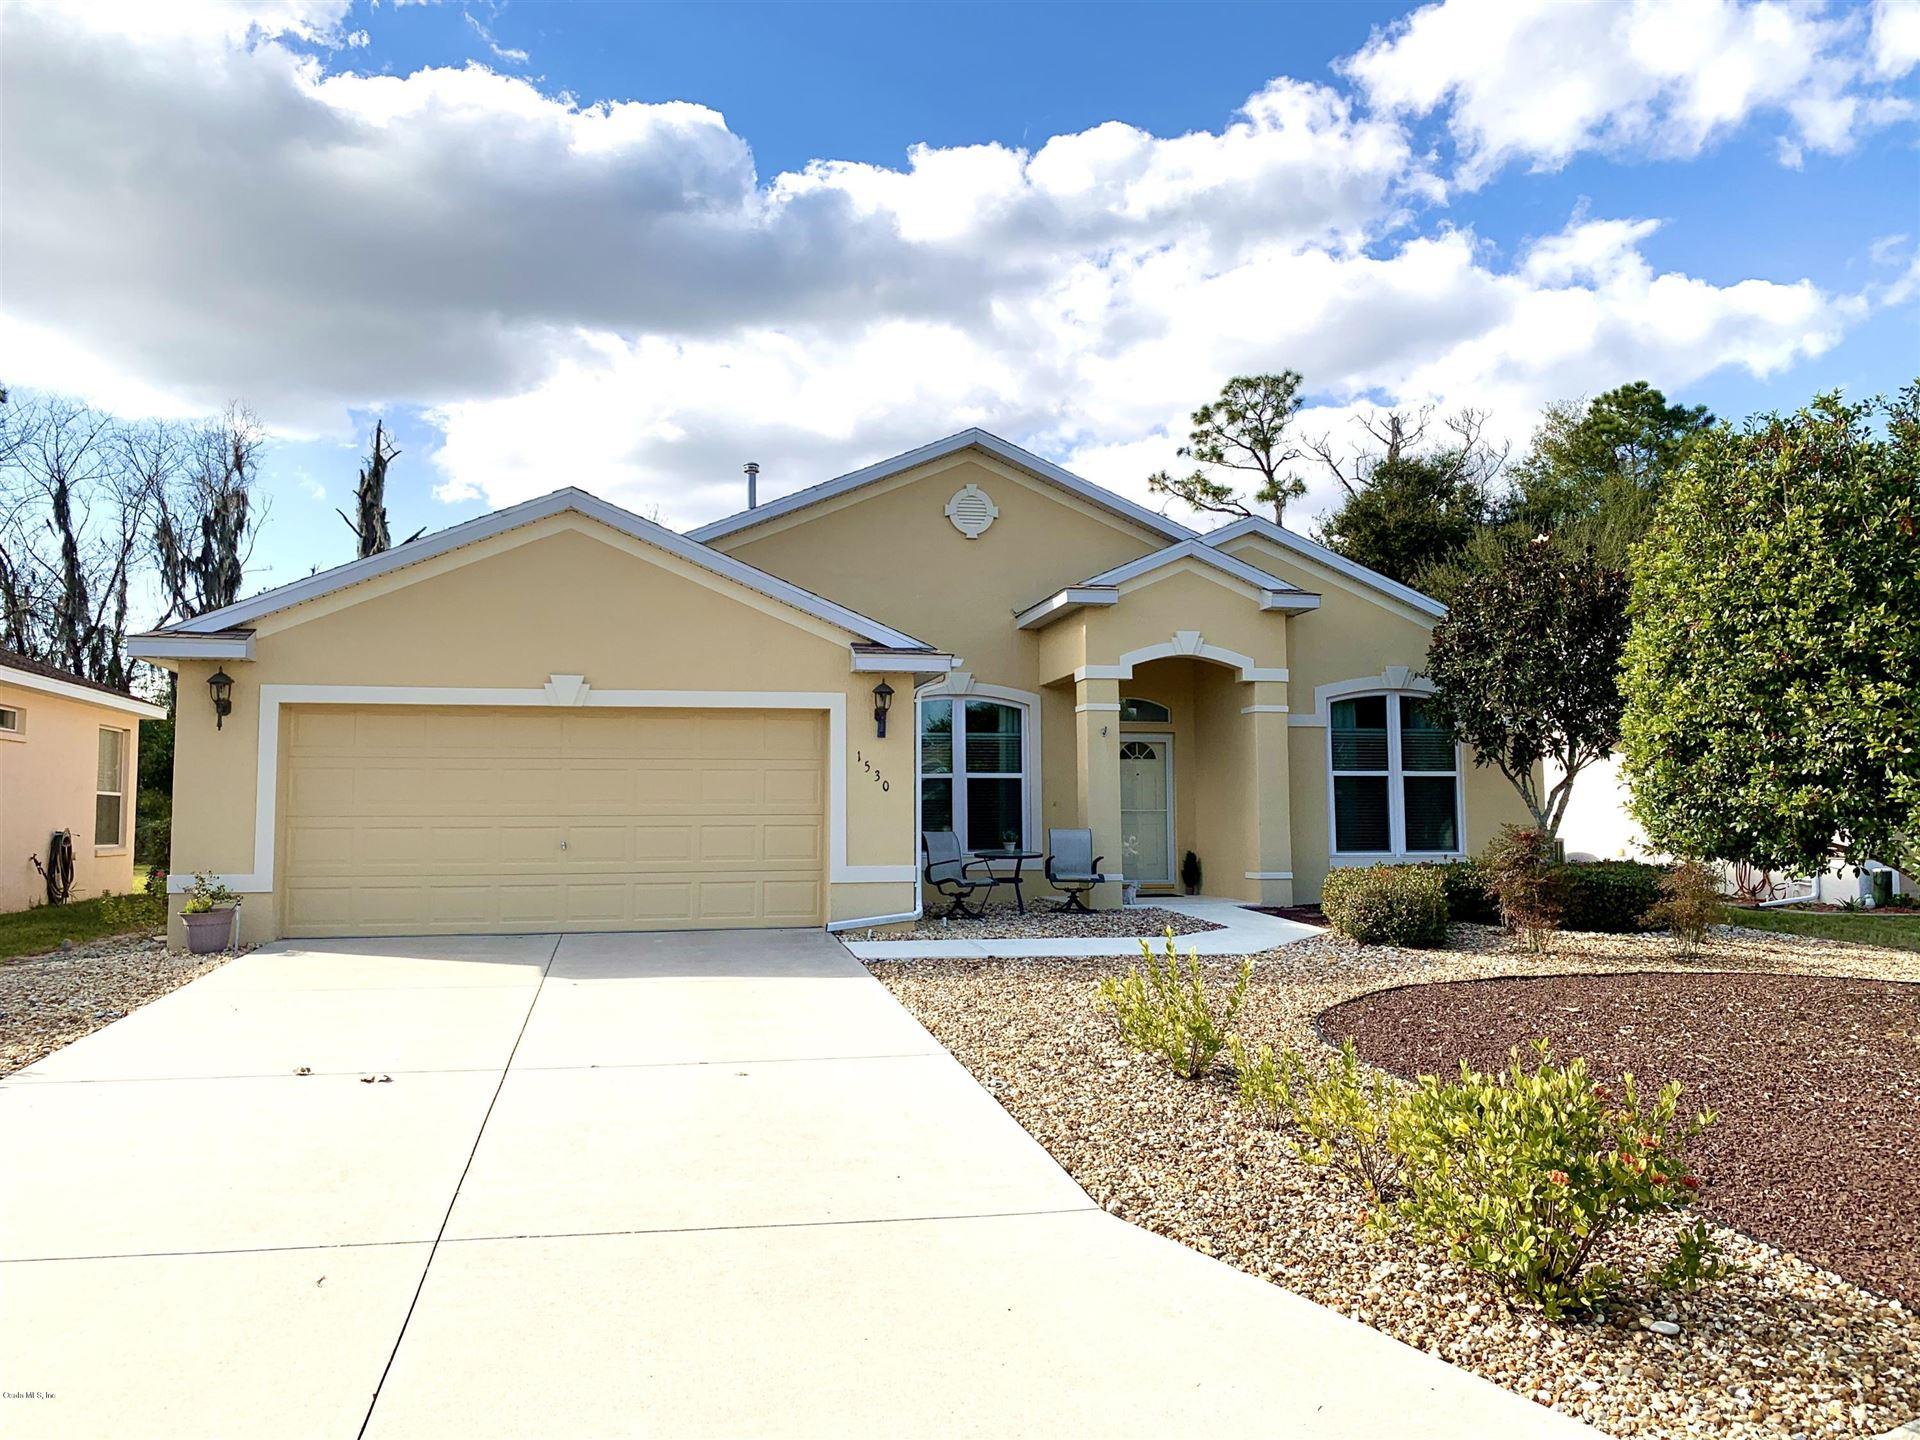 1530 SW 152nd Place, Ocala, FL 34473 - MLS#: 568560